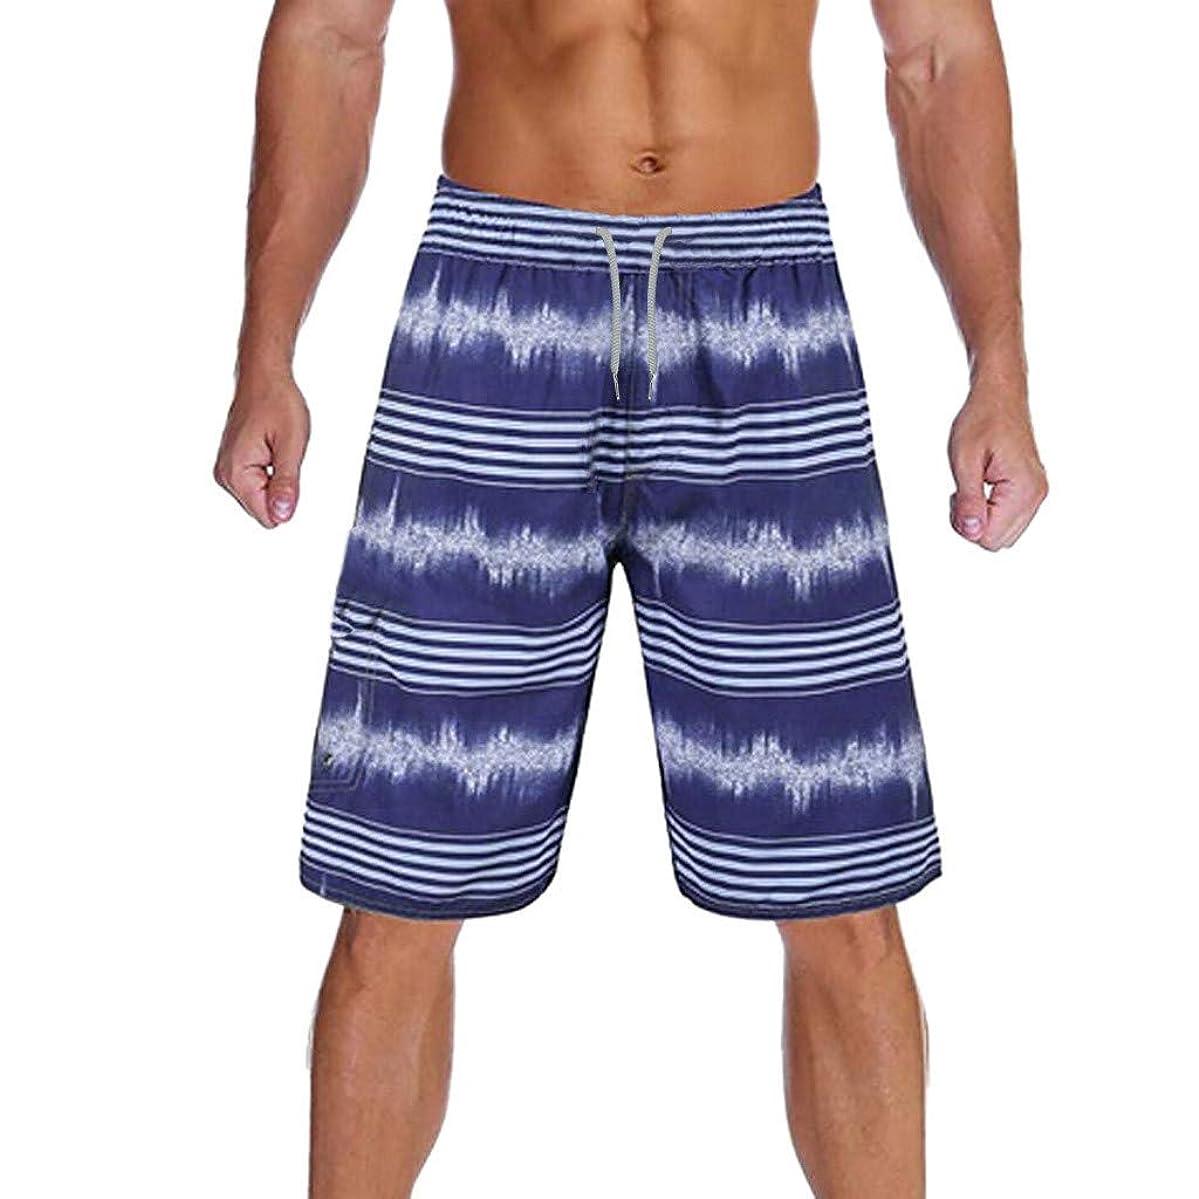 Surf Board Shorts,Men Fashion Splice Stripe Beach Work Casual Men Short Trouser Shorts Pants